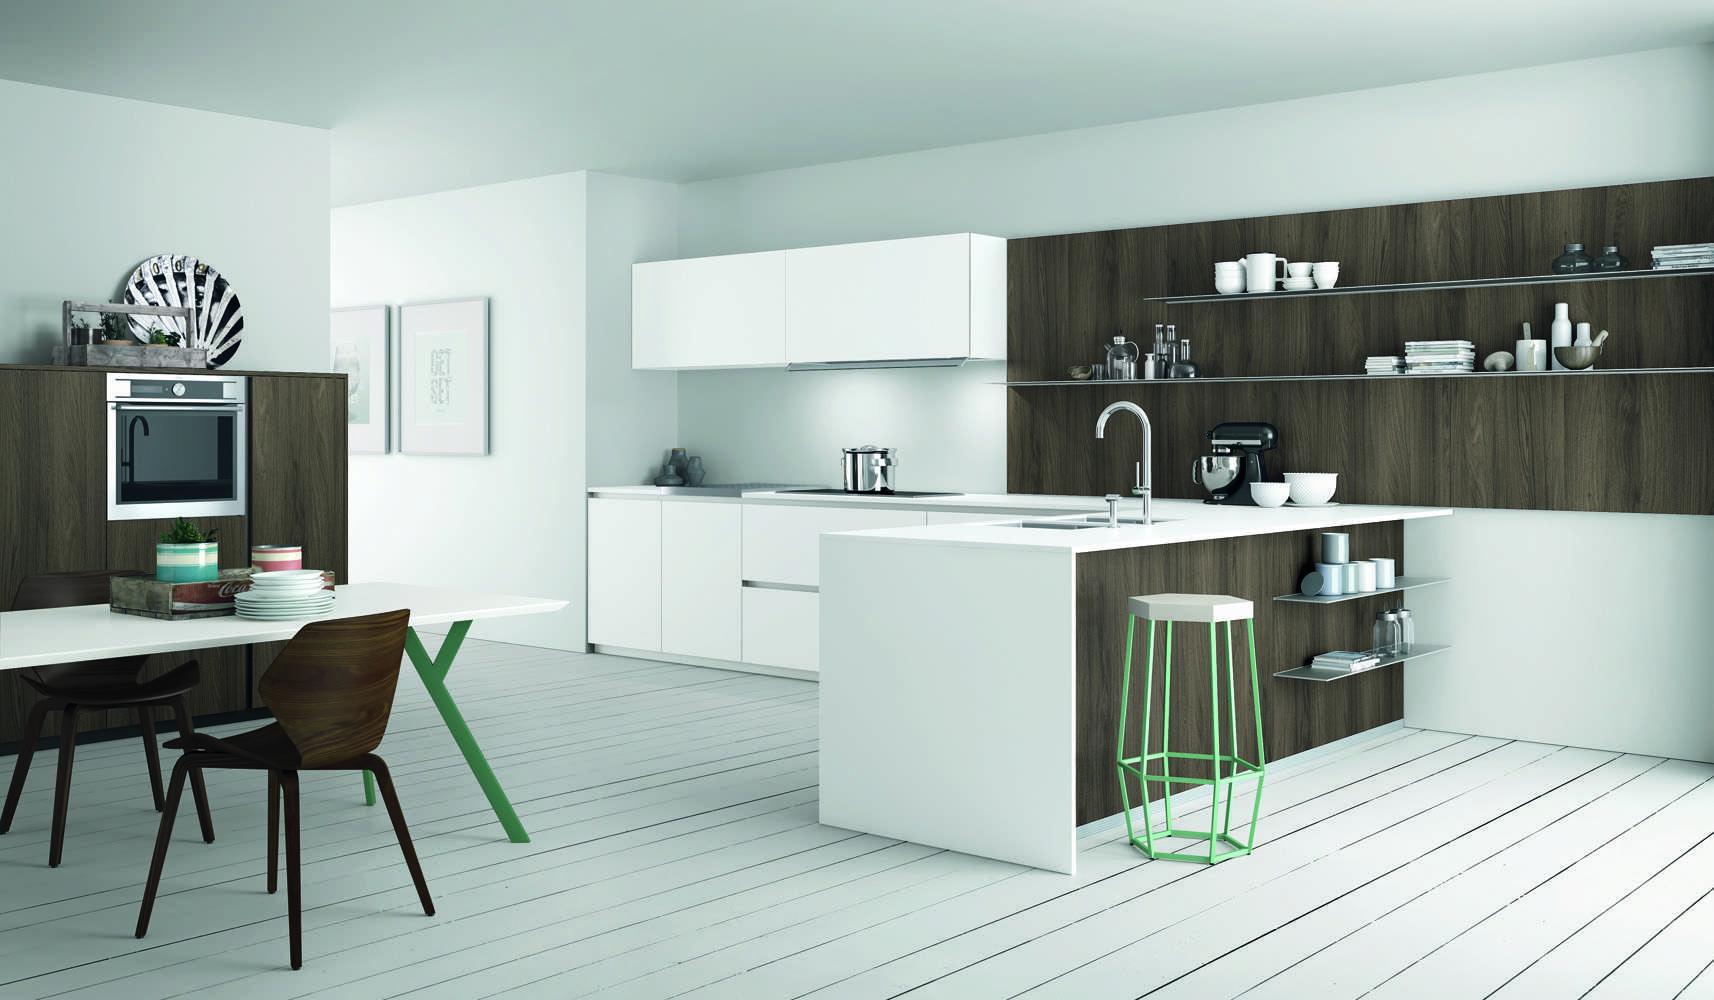 Arredamento e mobili per cucine a trento metrocubo for Offerte cucine trento